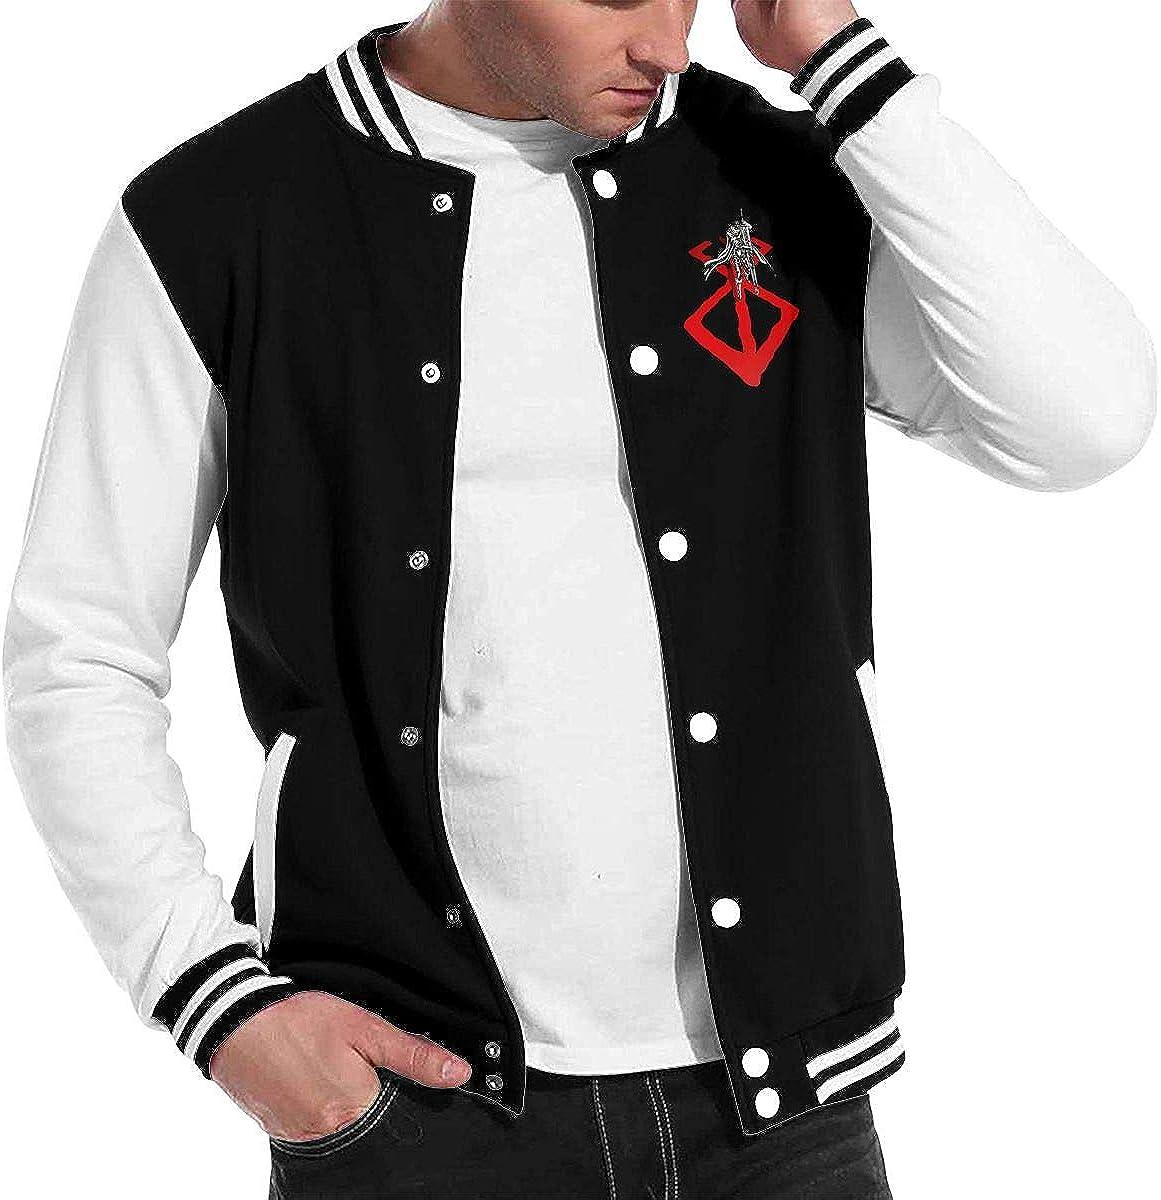 Gjfauehf Baseball Jacket Berserk Uniform Unisex Sweater Coat